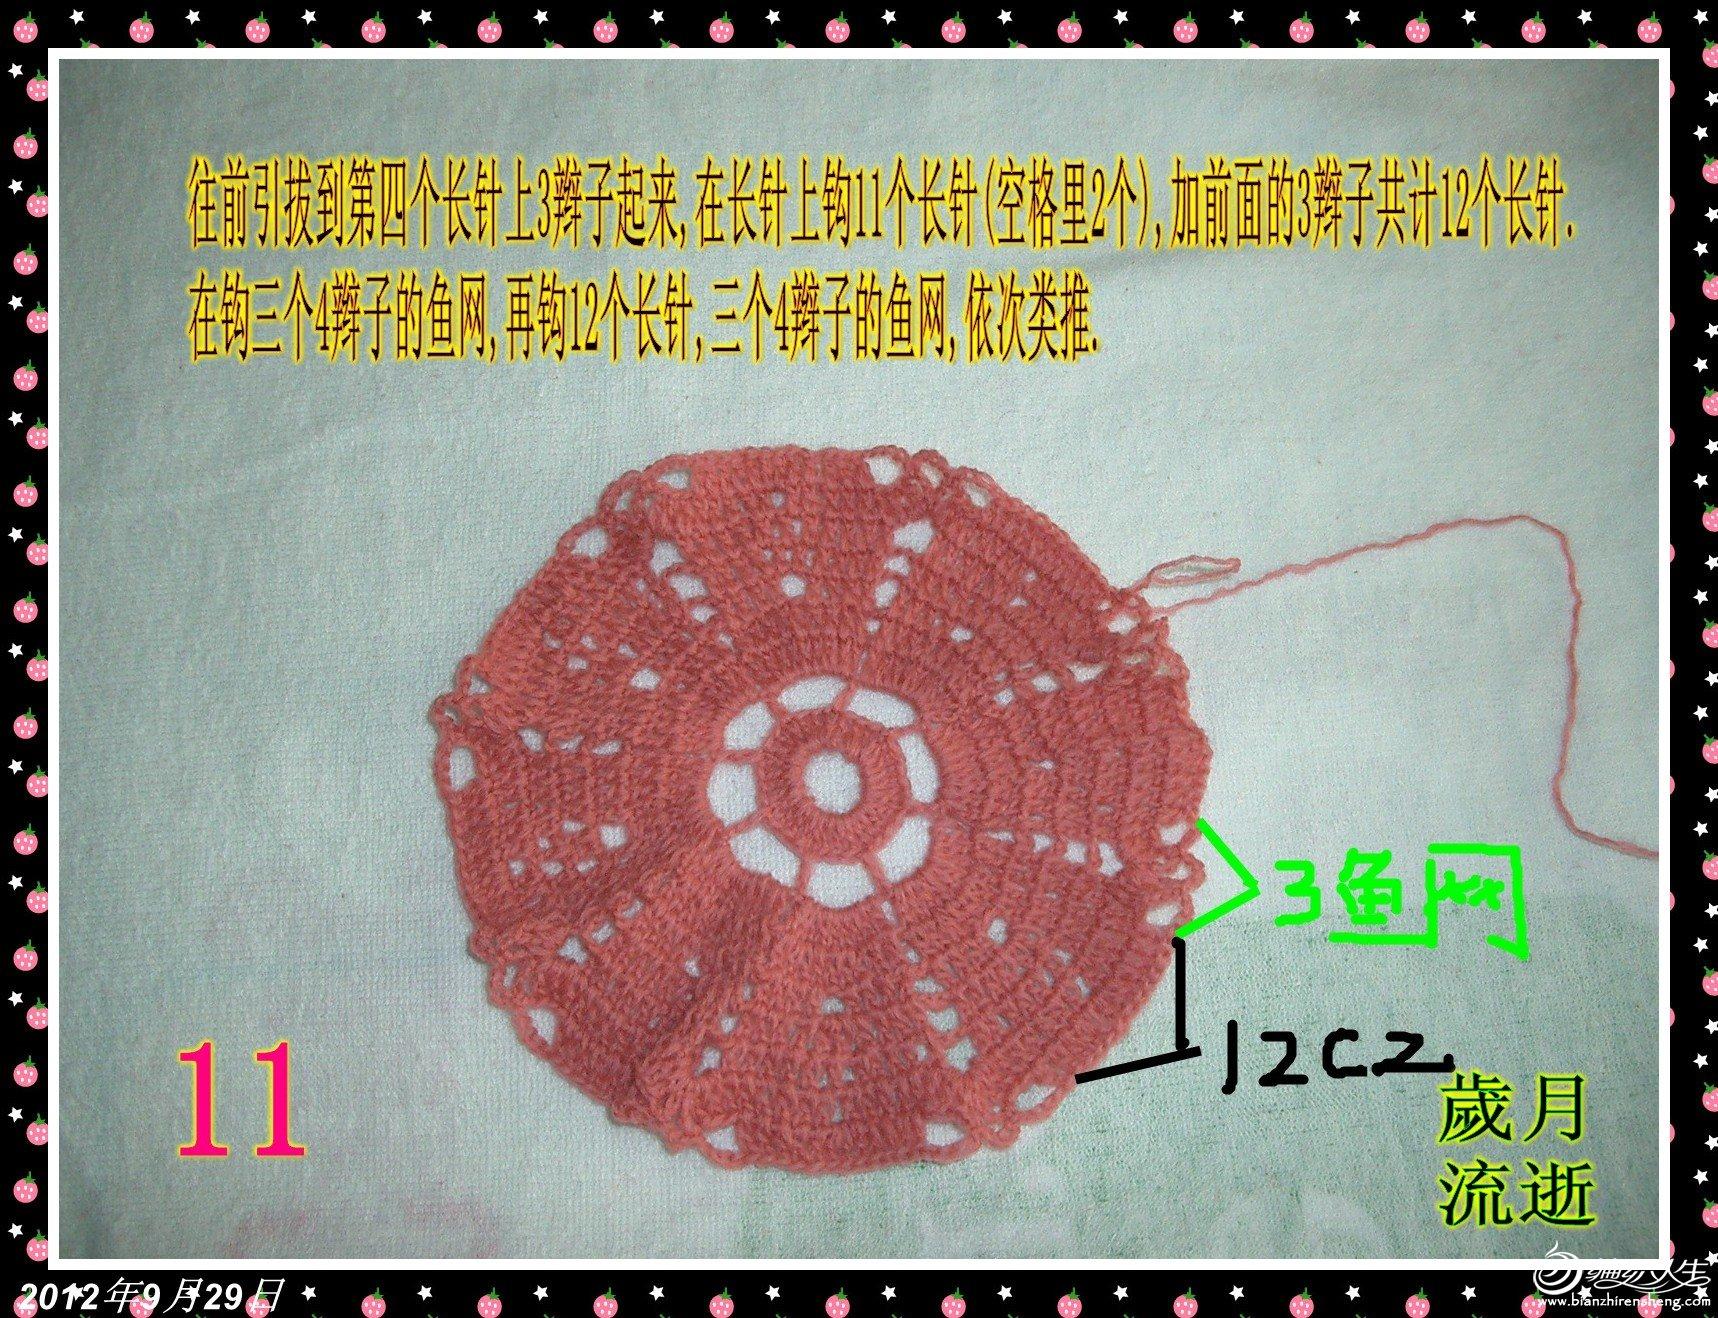 CIMG6291_conew2.jpg